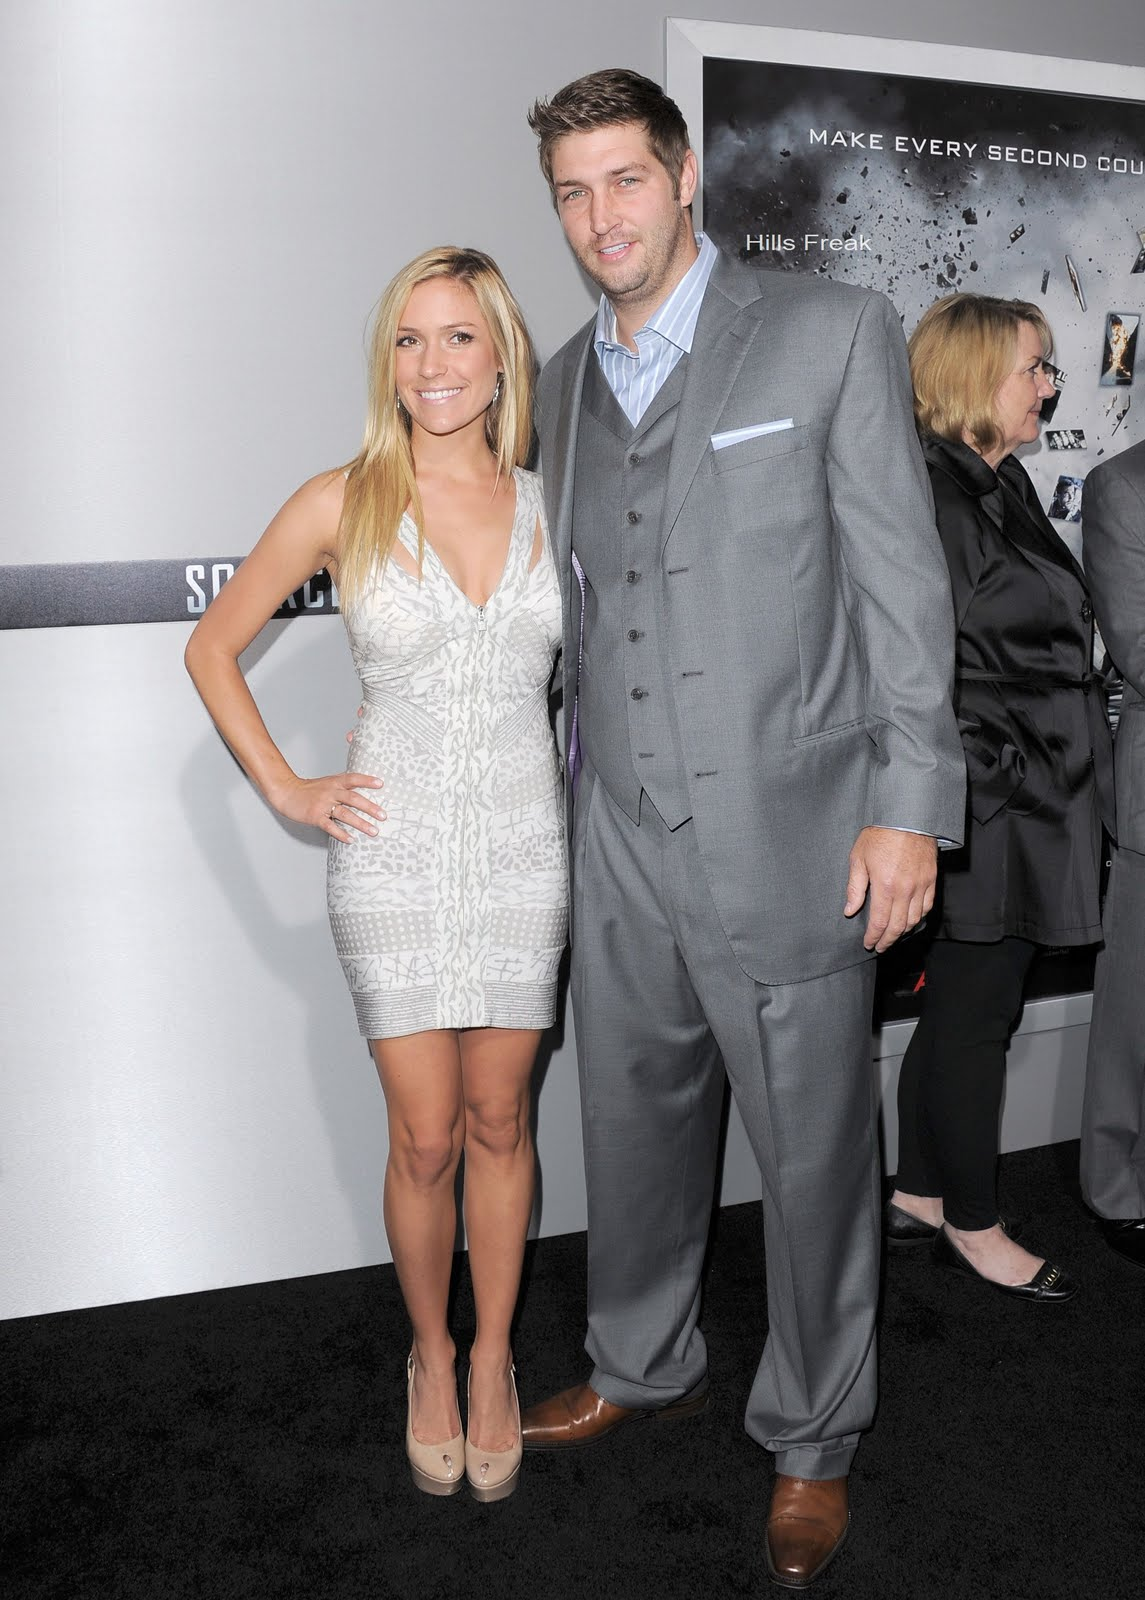 Hills Freak: Kristin Cavallari & Jay Cutler: Attend the ...